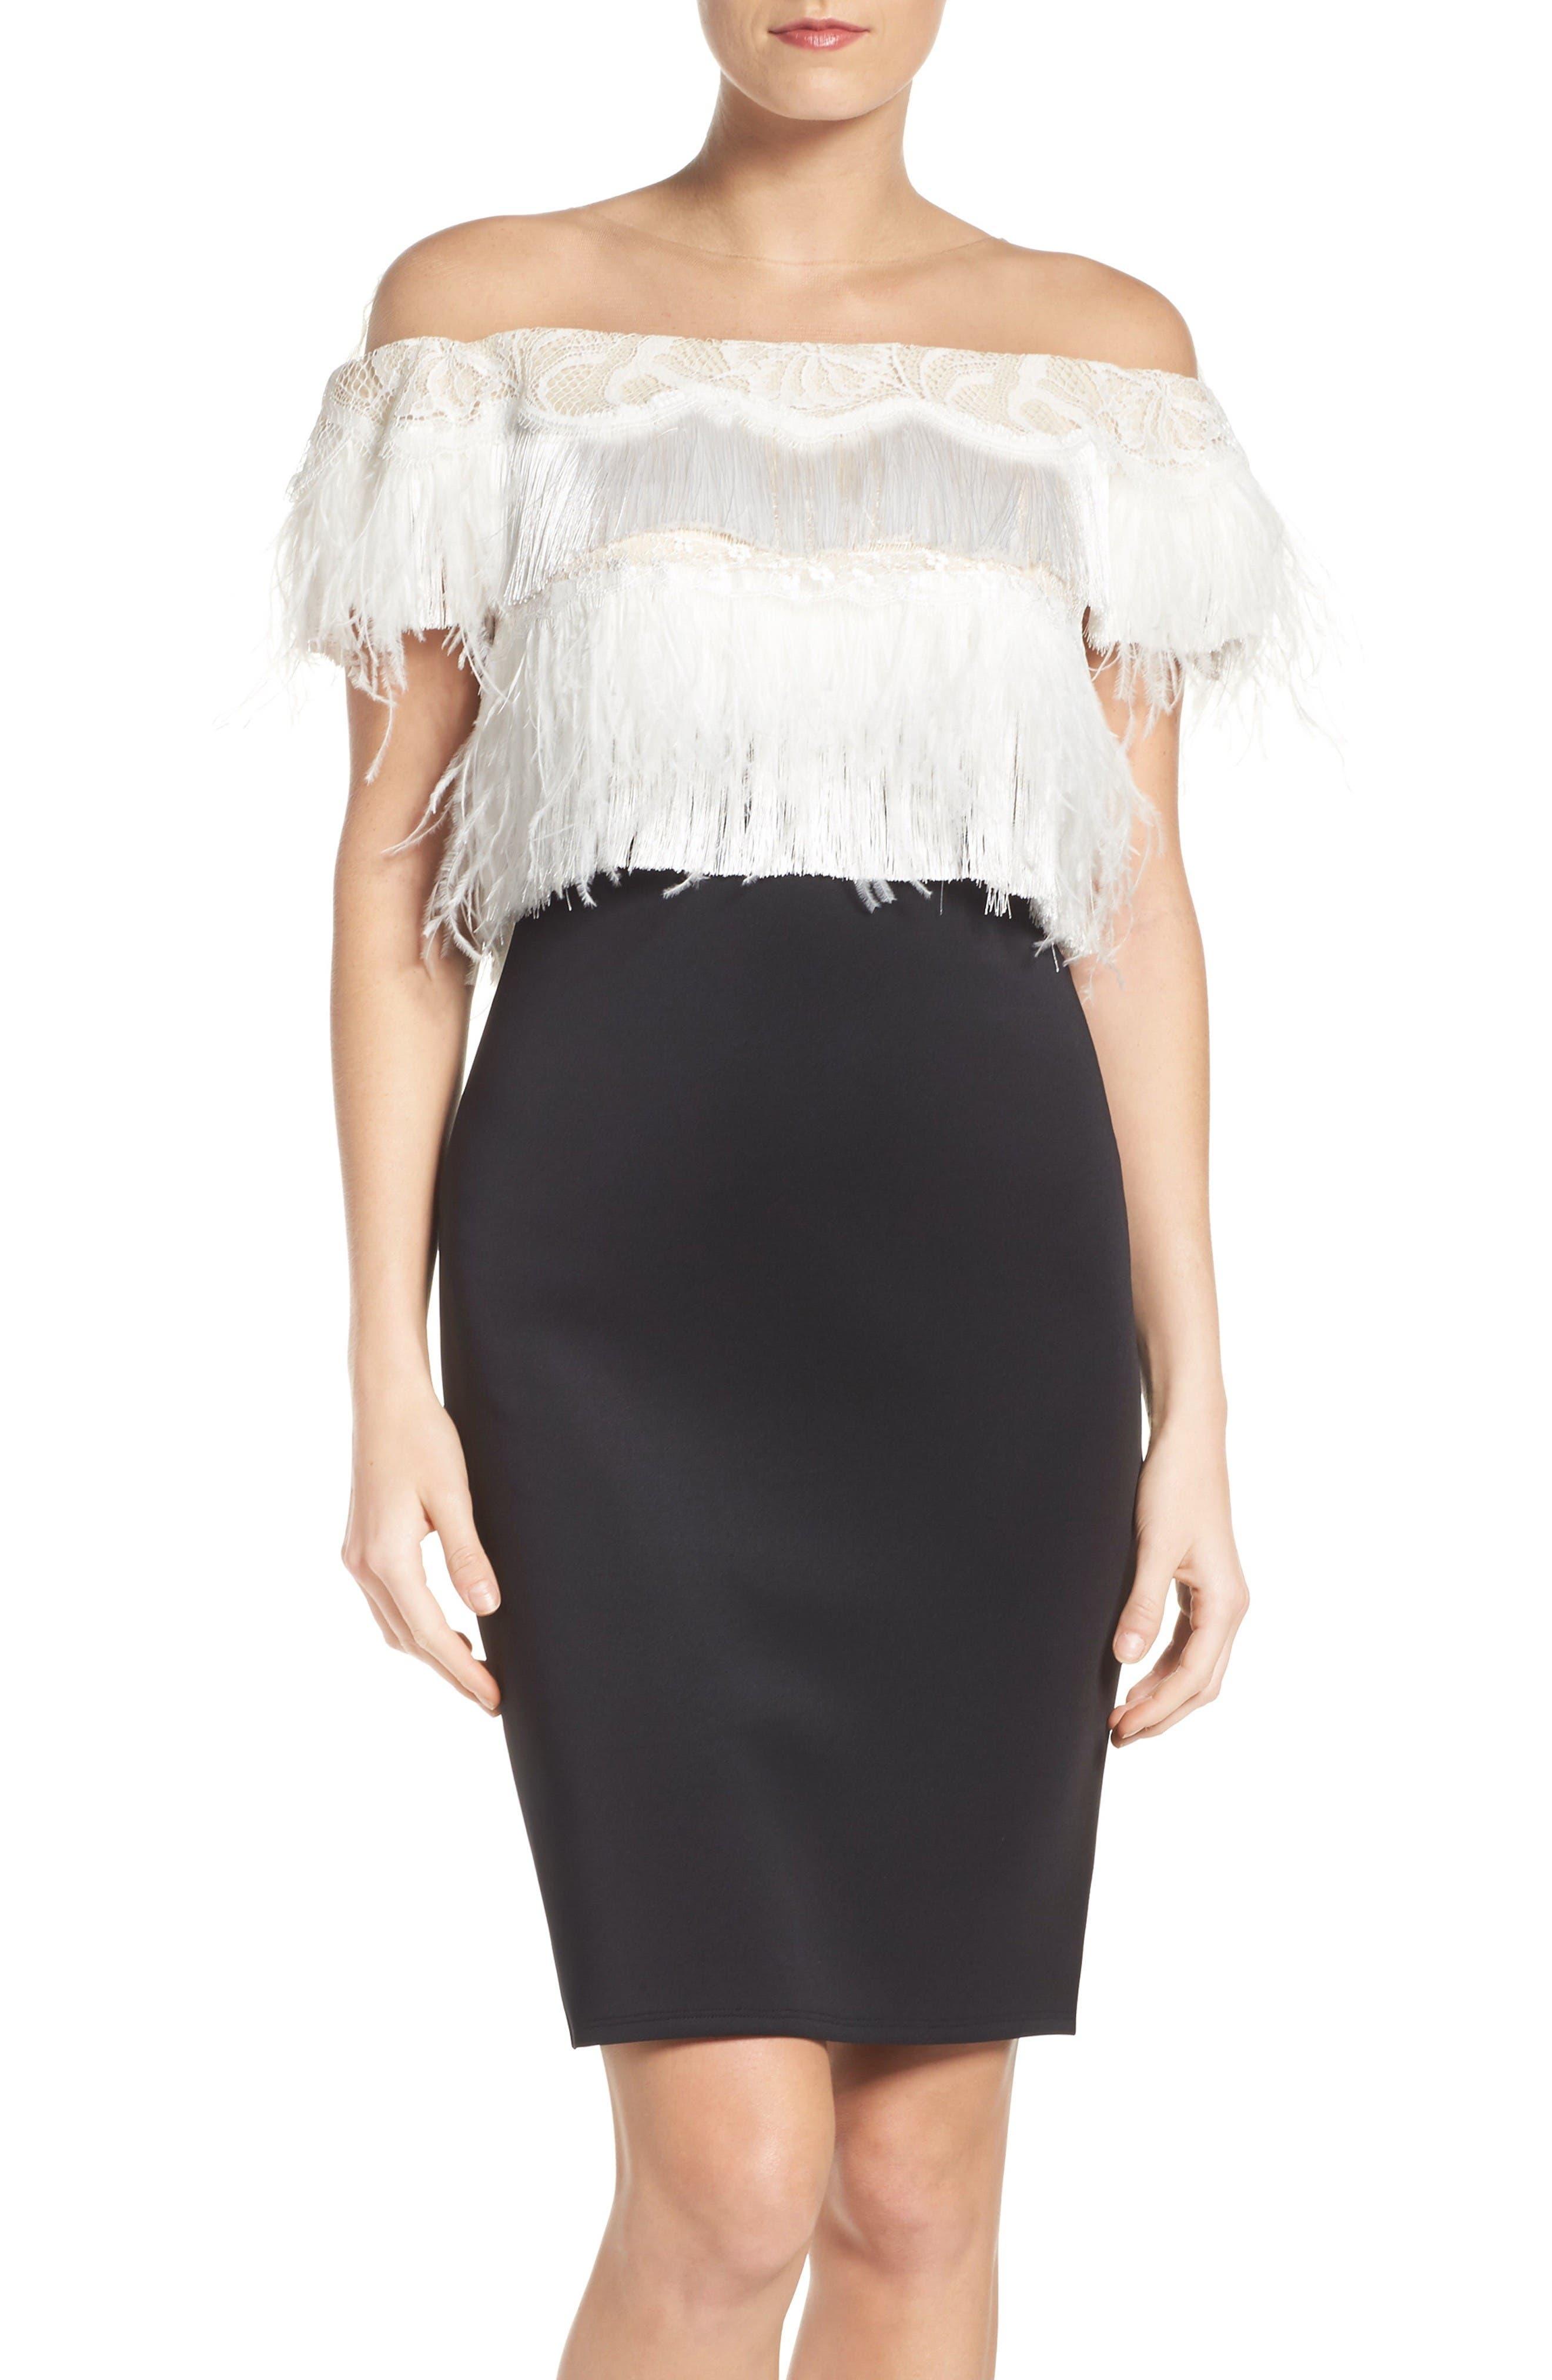 Off the Shoulder Sheath Dress,                             Main thumbnail 1, color,                             Black/ Ivory